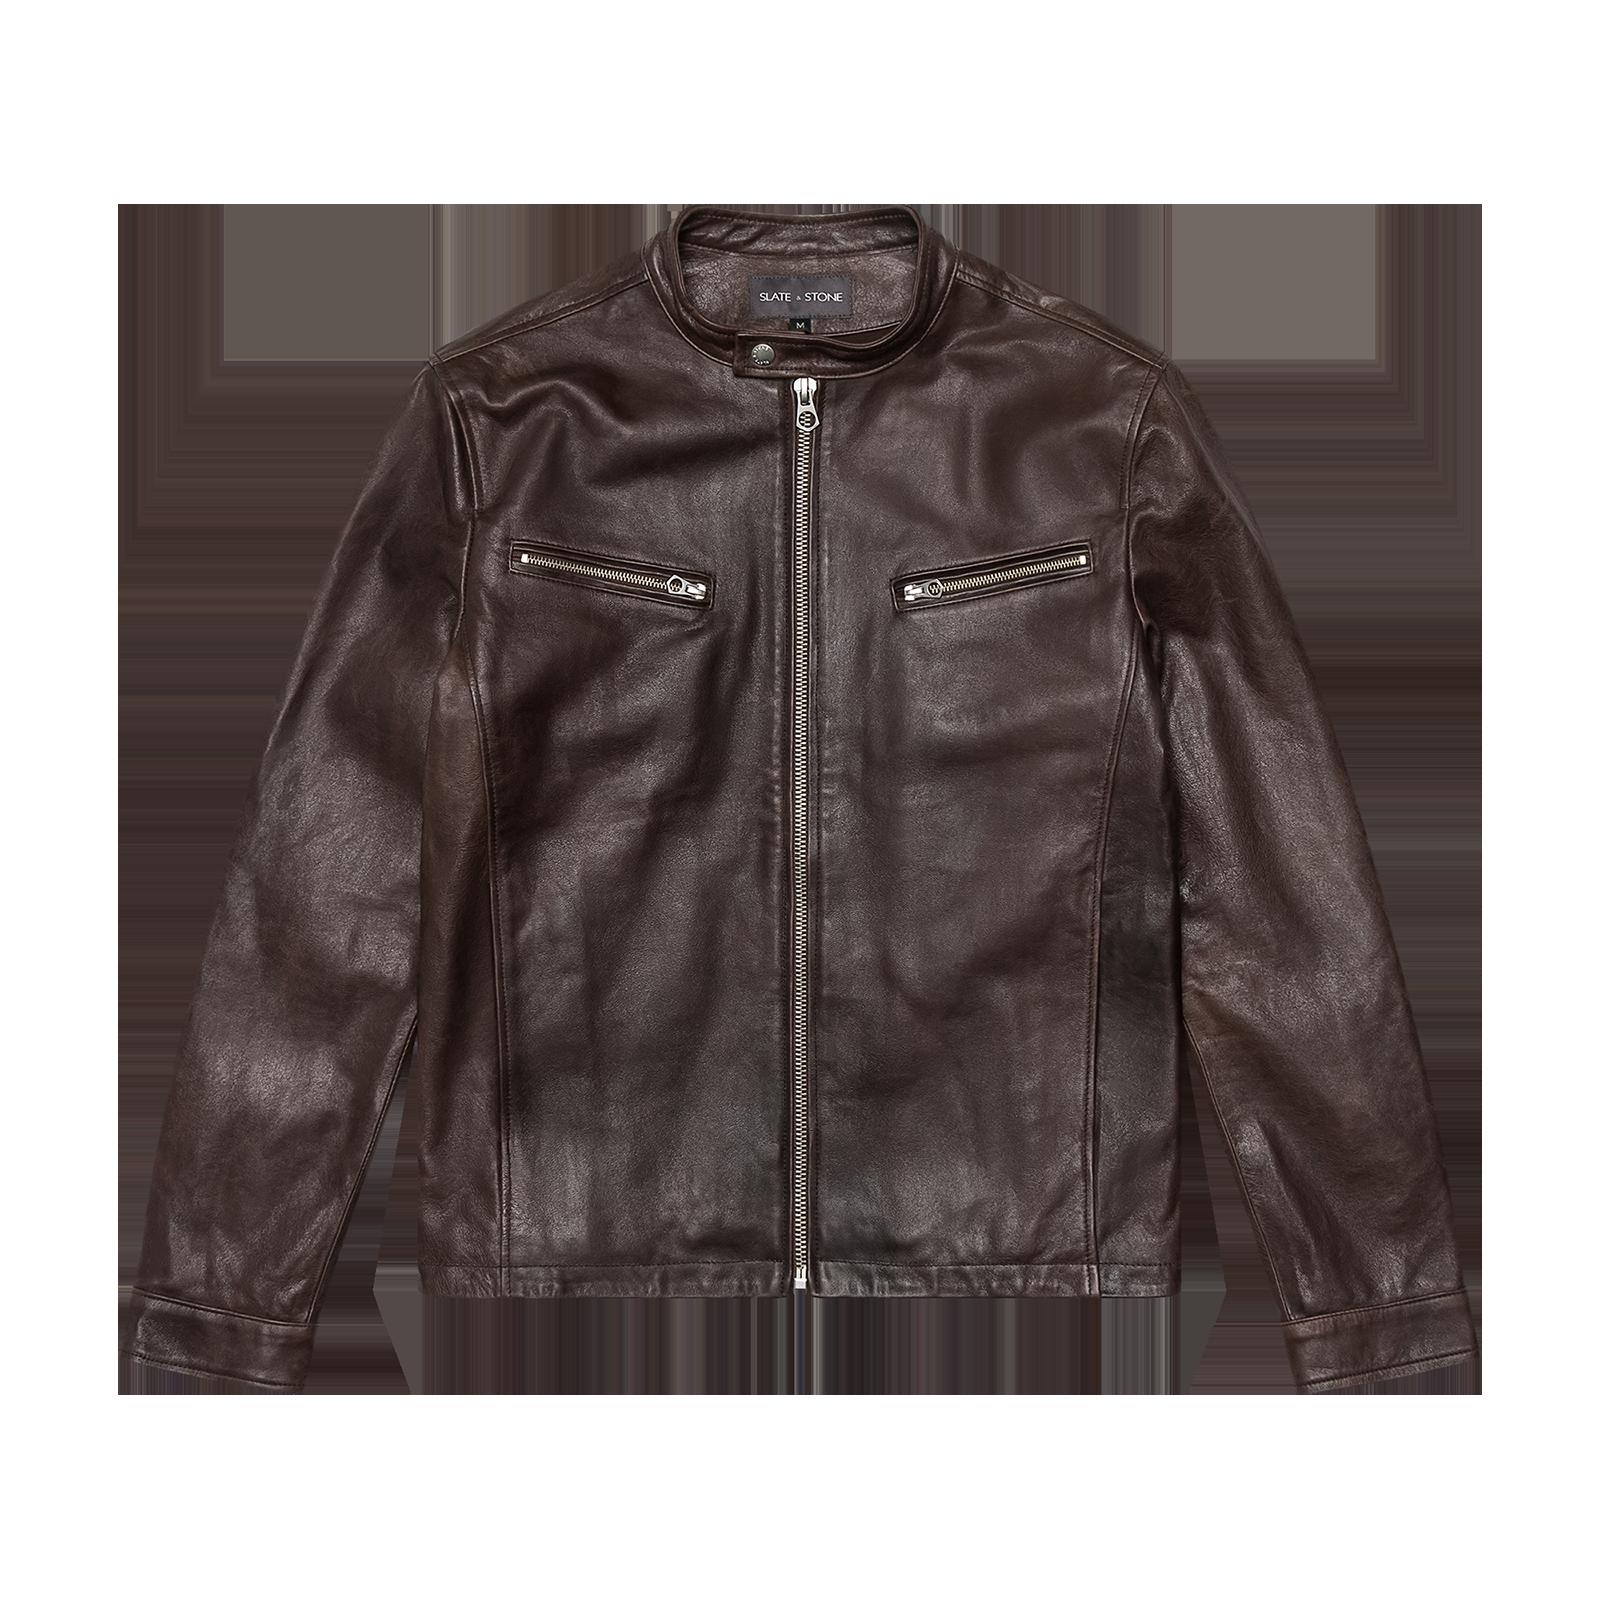 Leather jacket  product photography